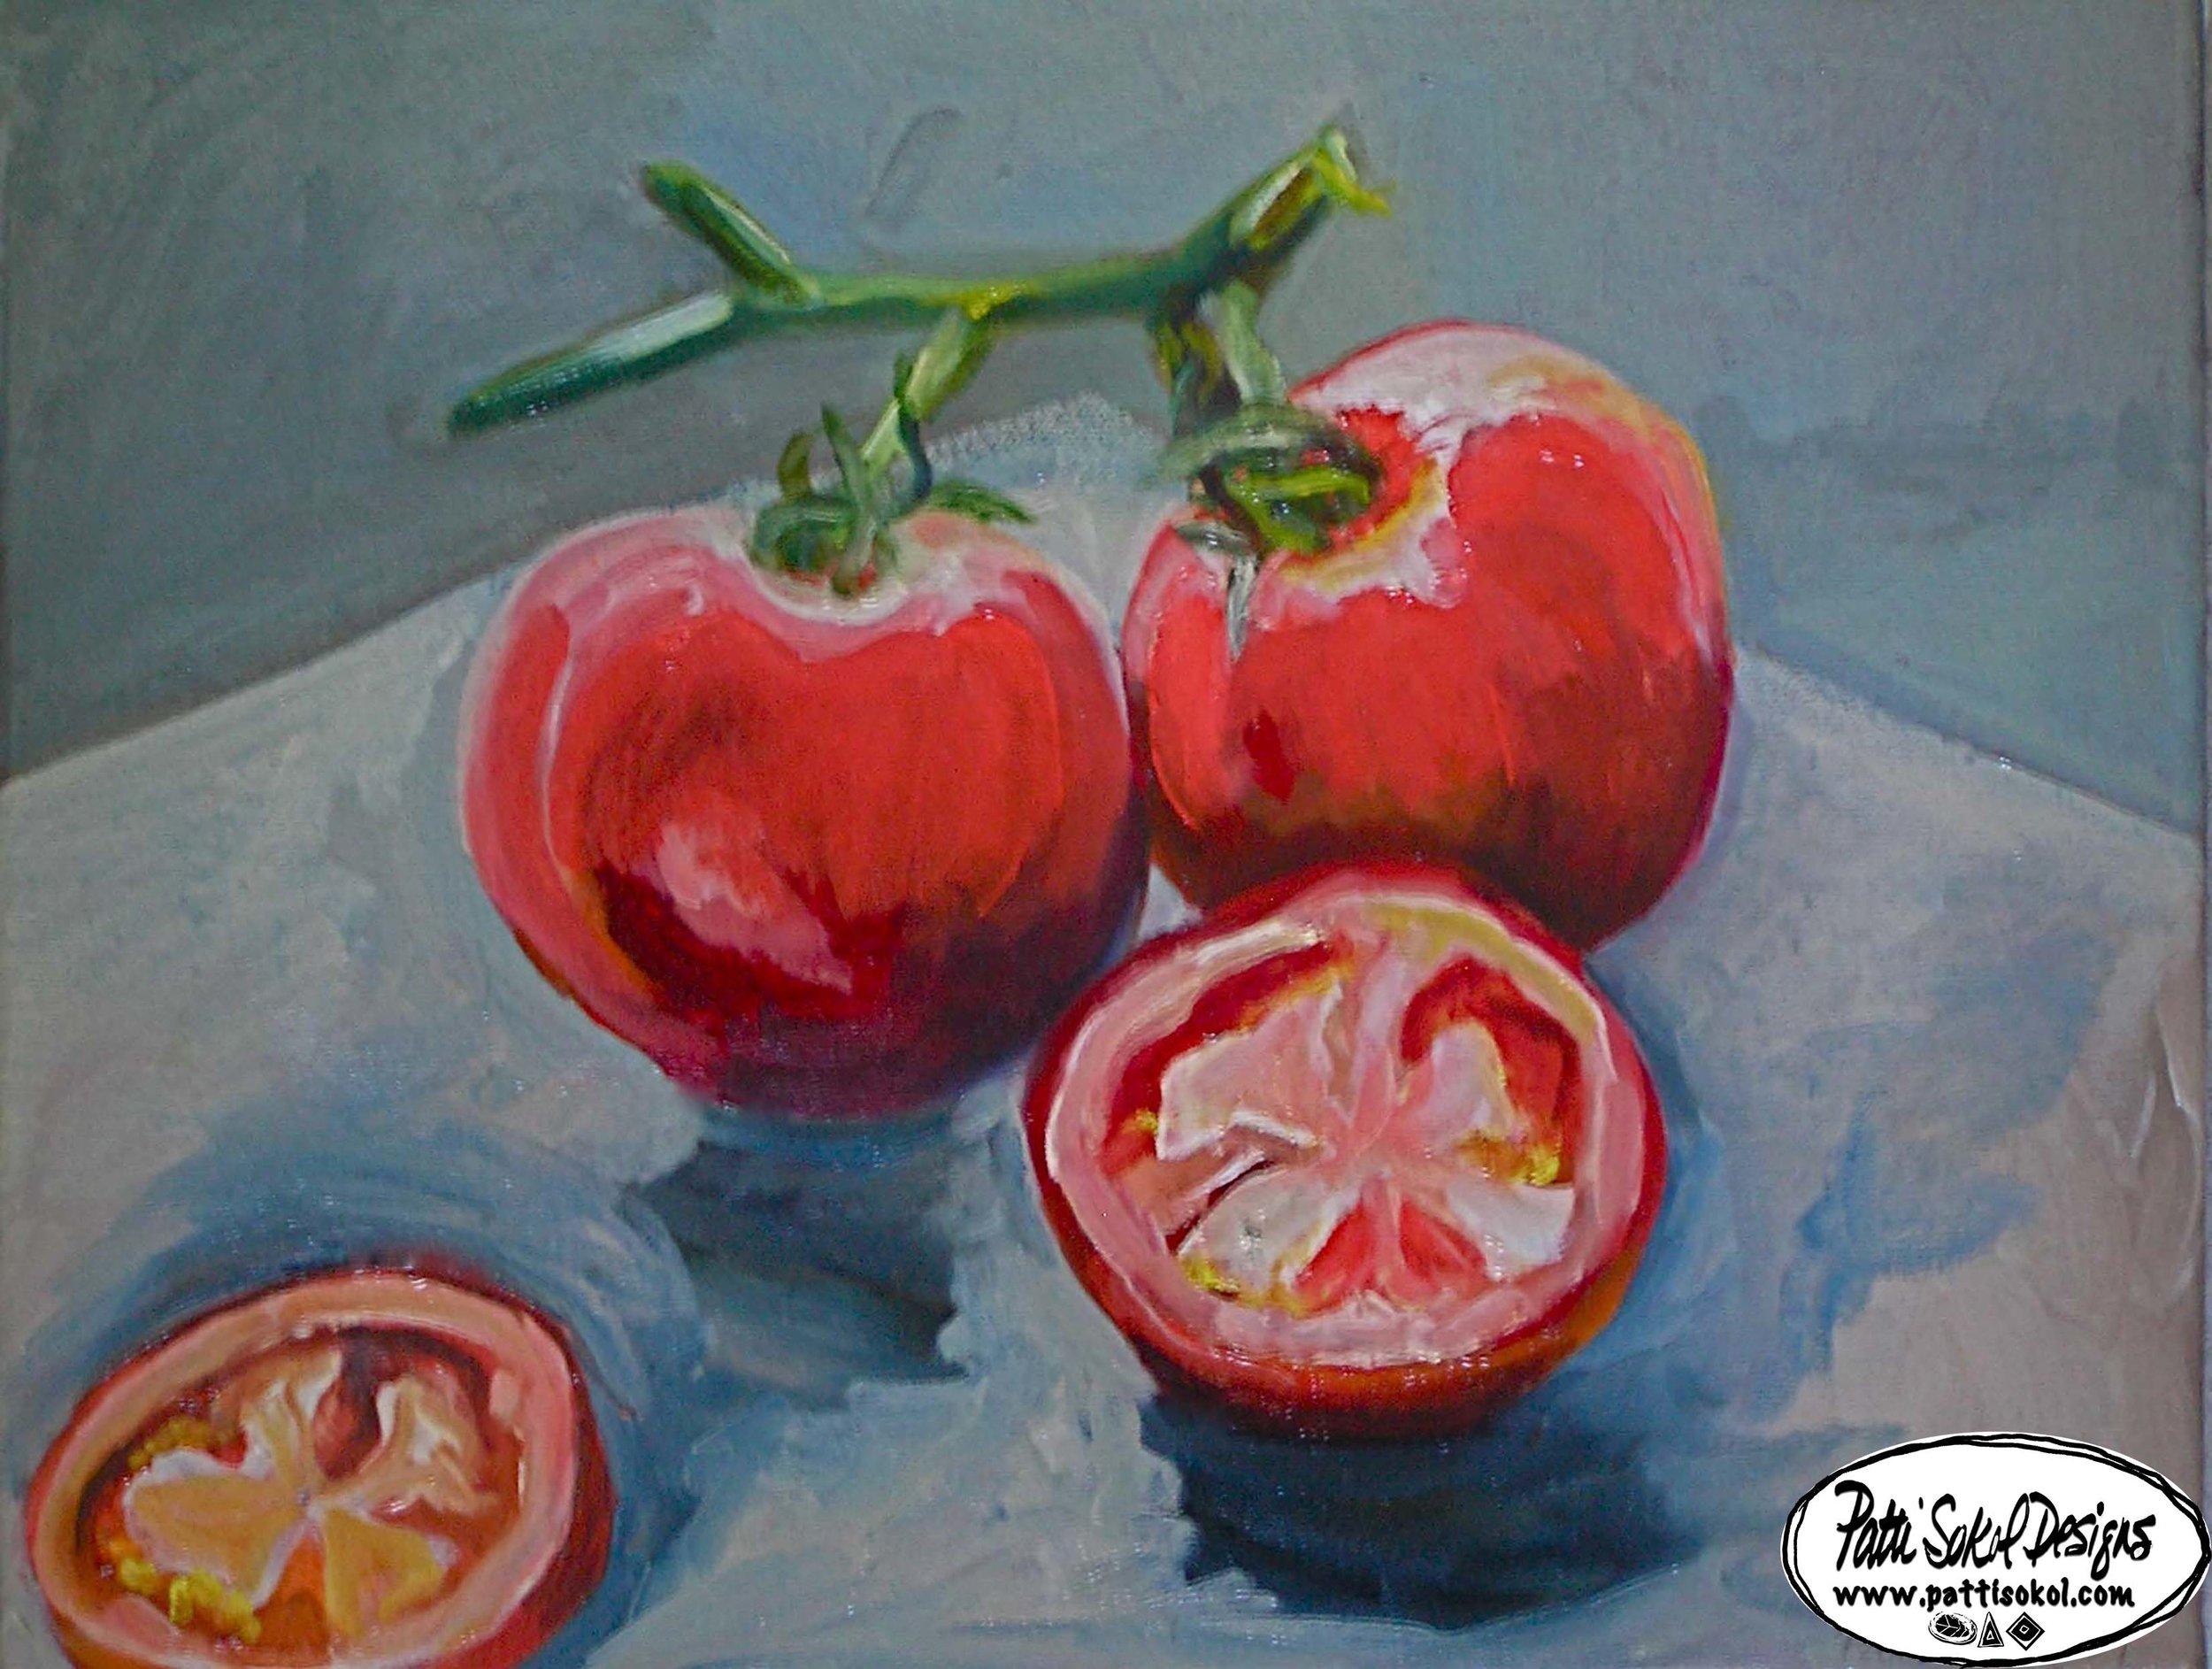 PattiSokolDesigns_Tomatoes.jpg